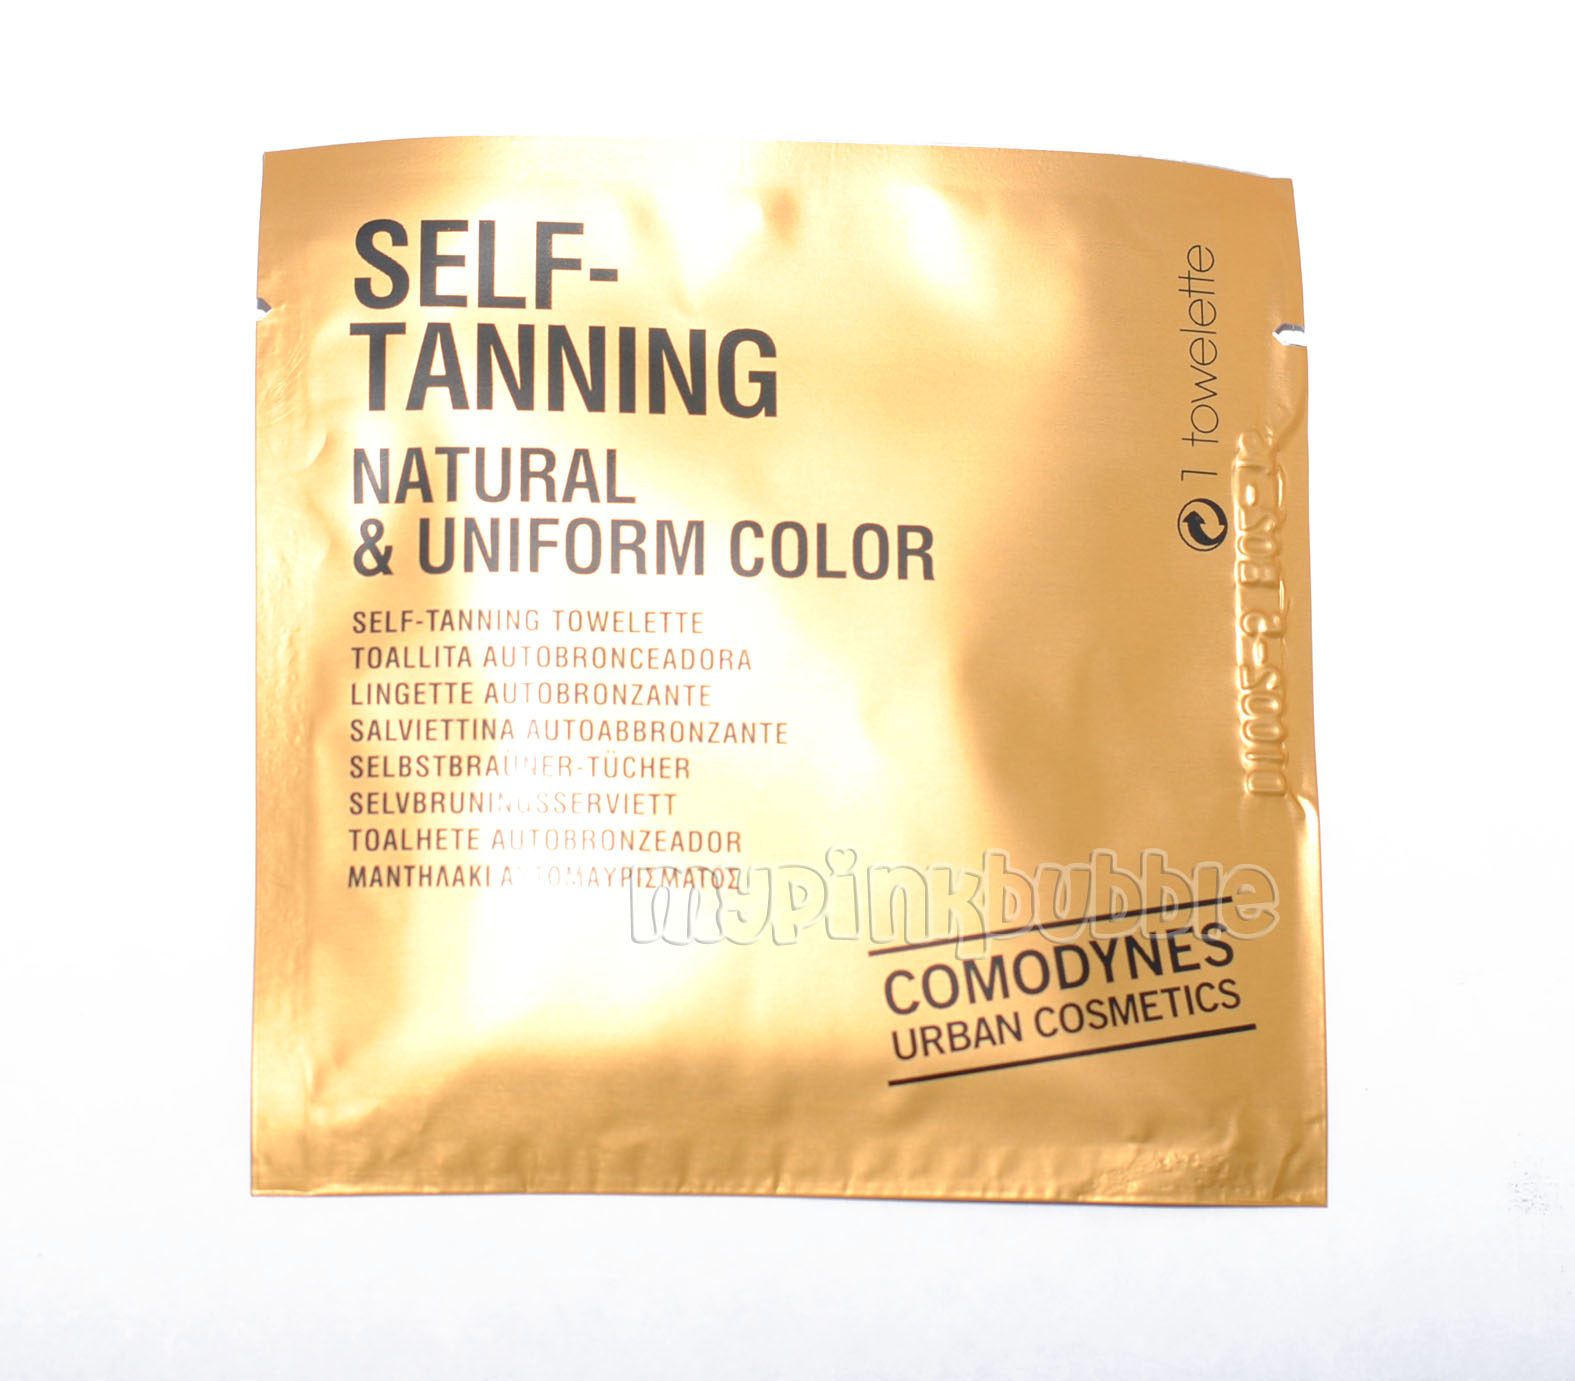 Toallita Self-Tanning Natural & Uniform Color